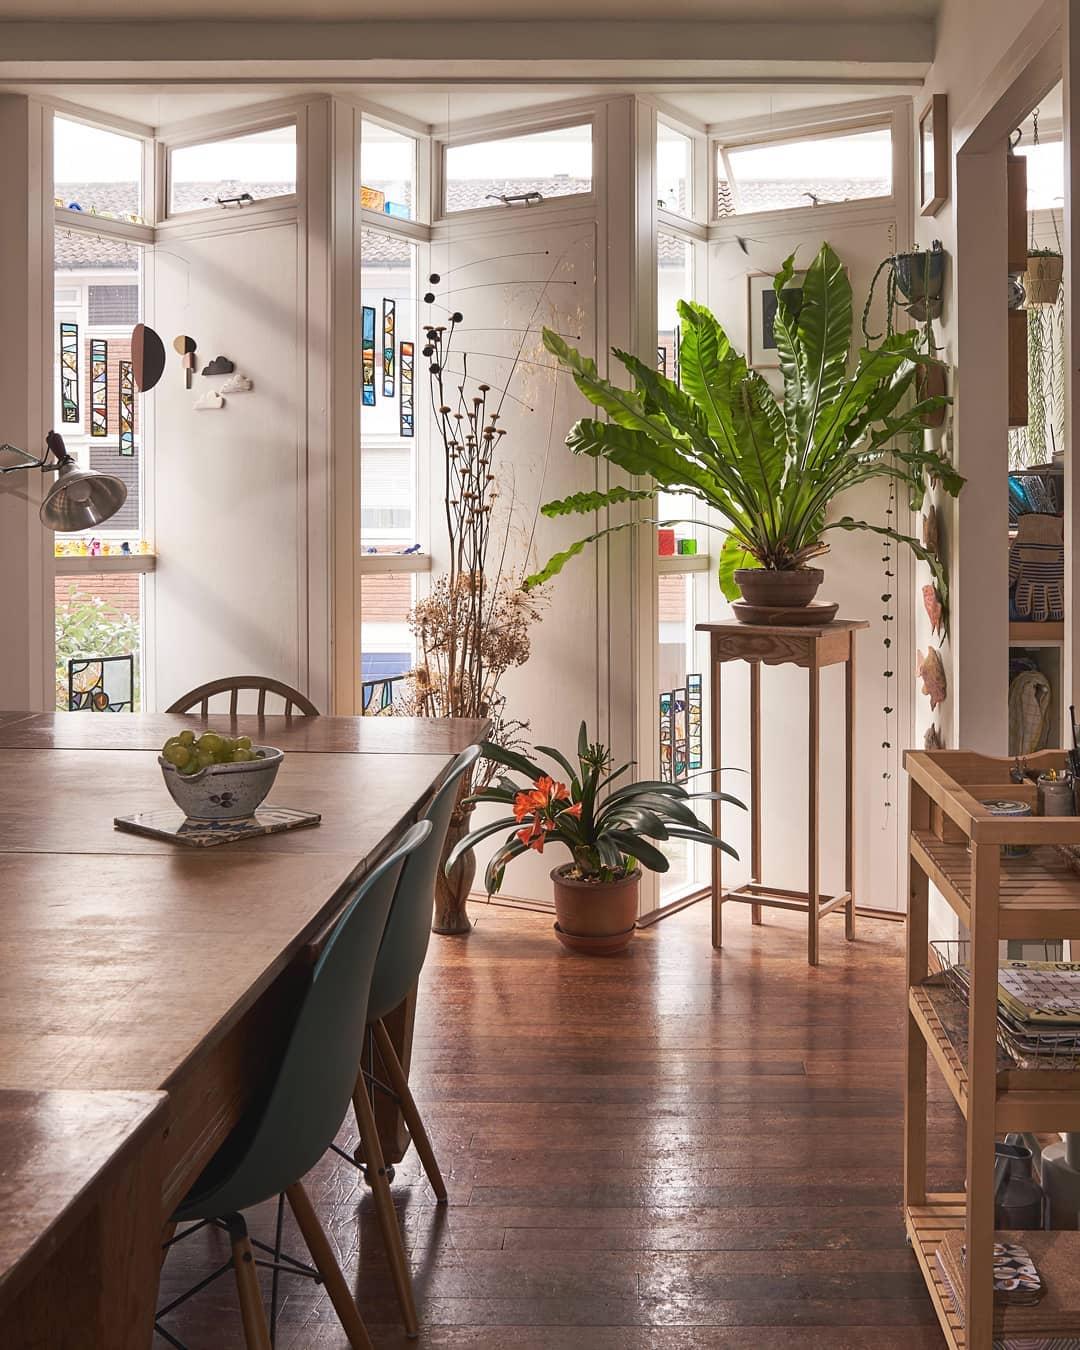 spanhouse 70s botanicalwitches naturallight shadow light minimalism architecture interiors interiordesign